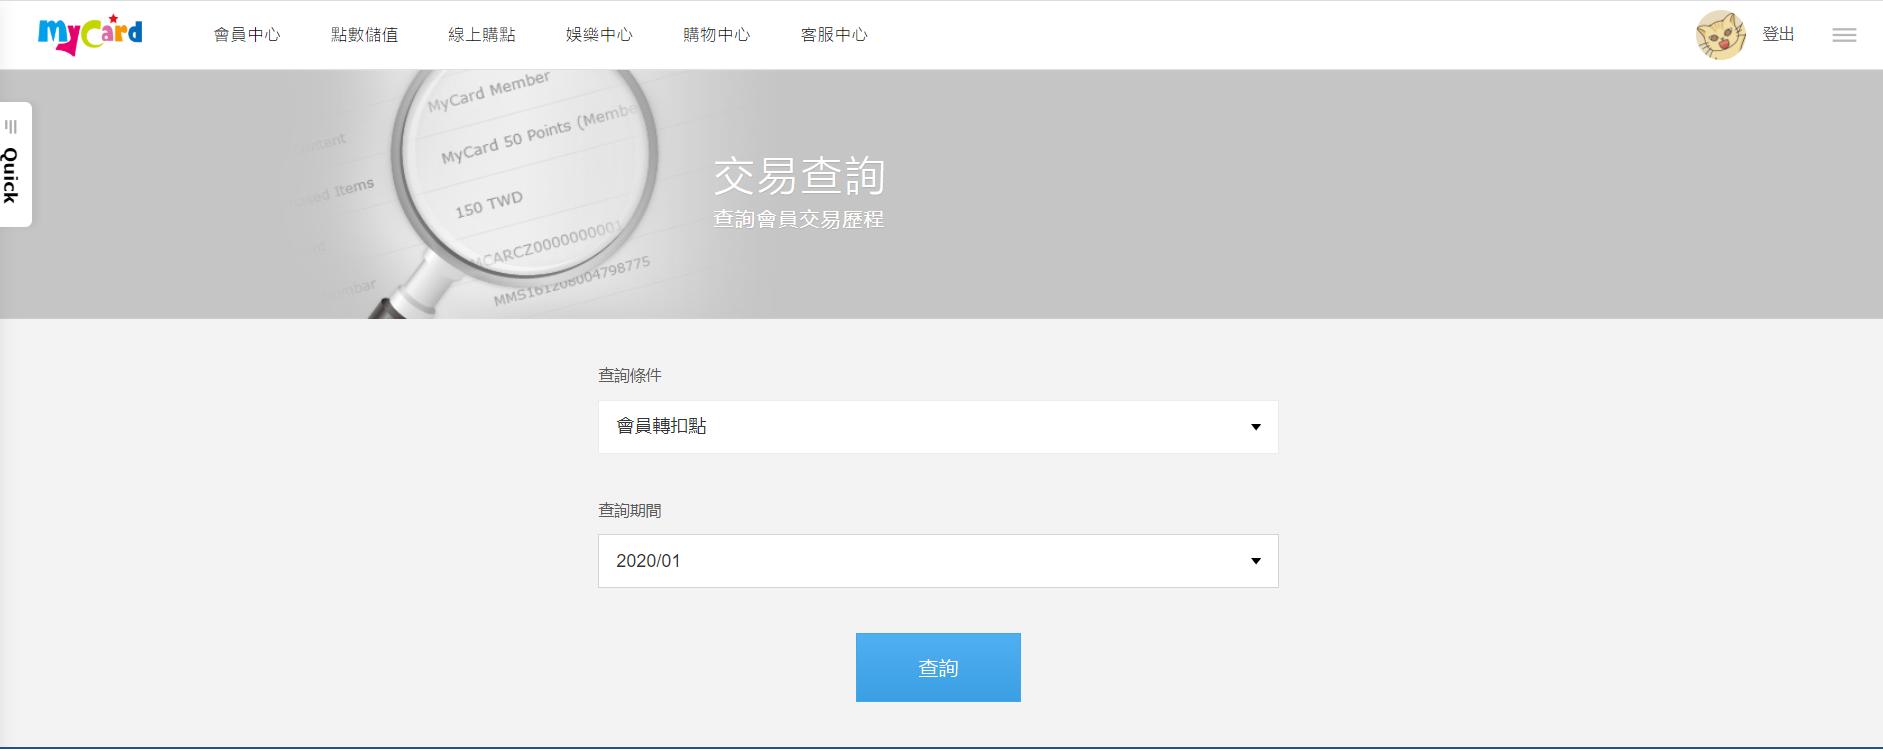 Mycard儲值活動詳細流程指南-会员转扣点.png